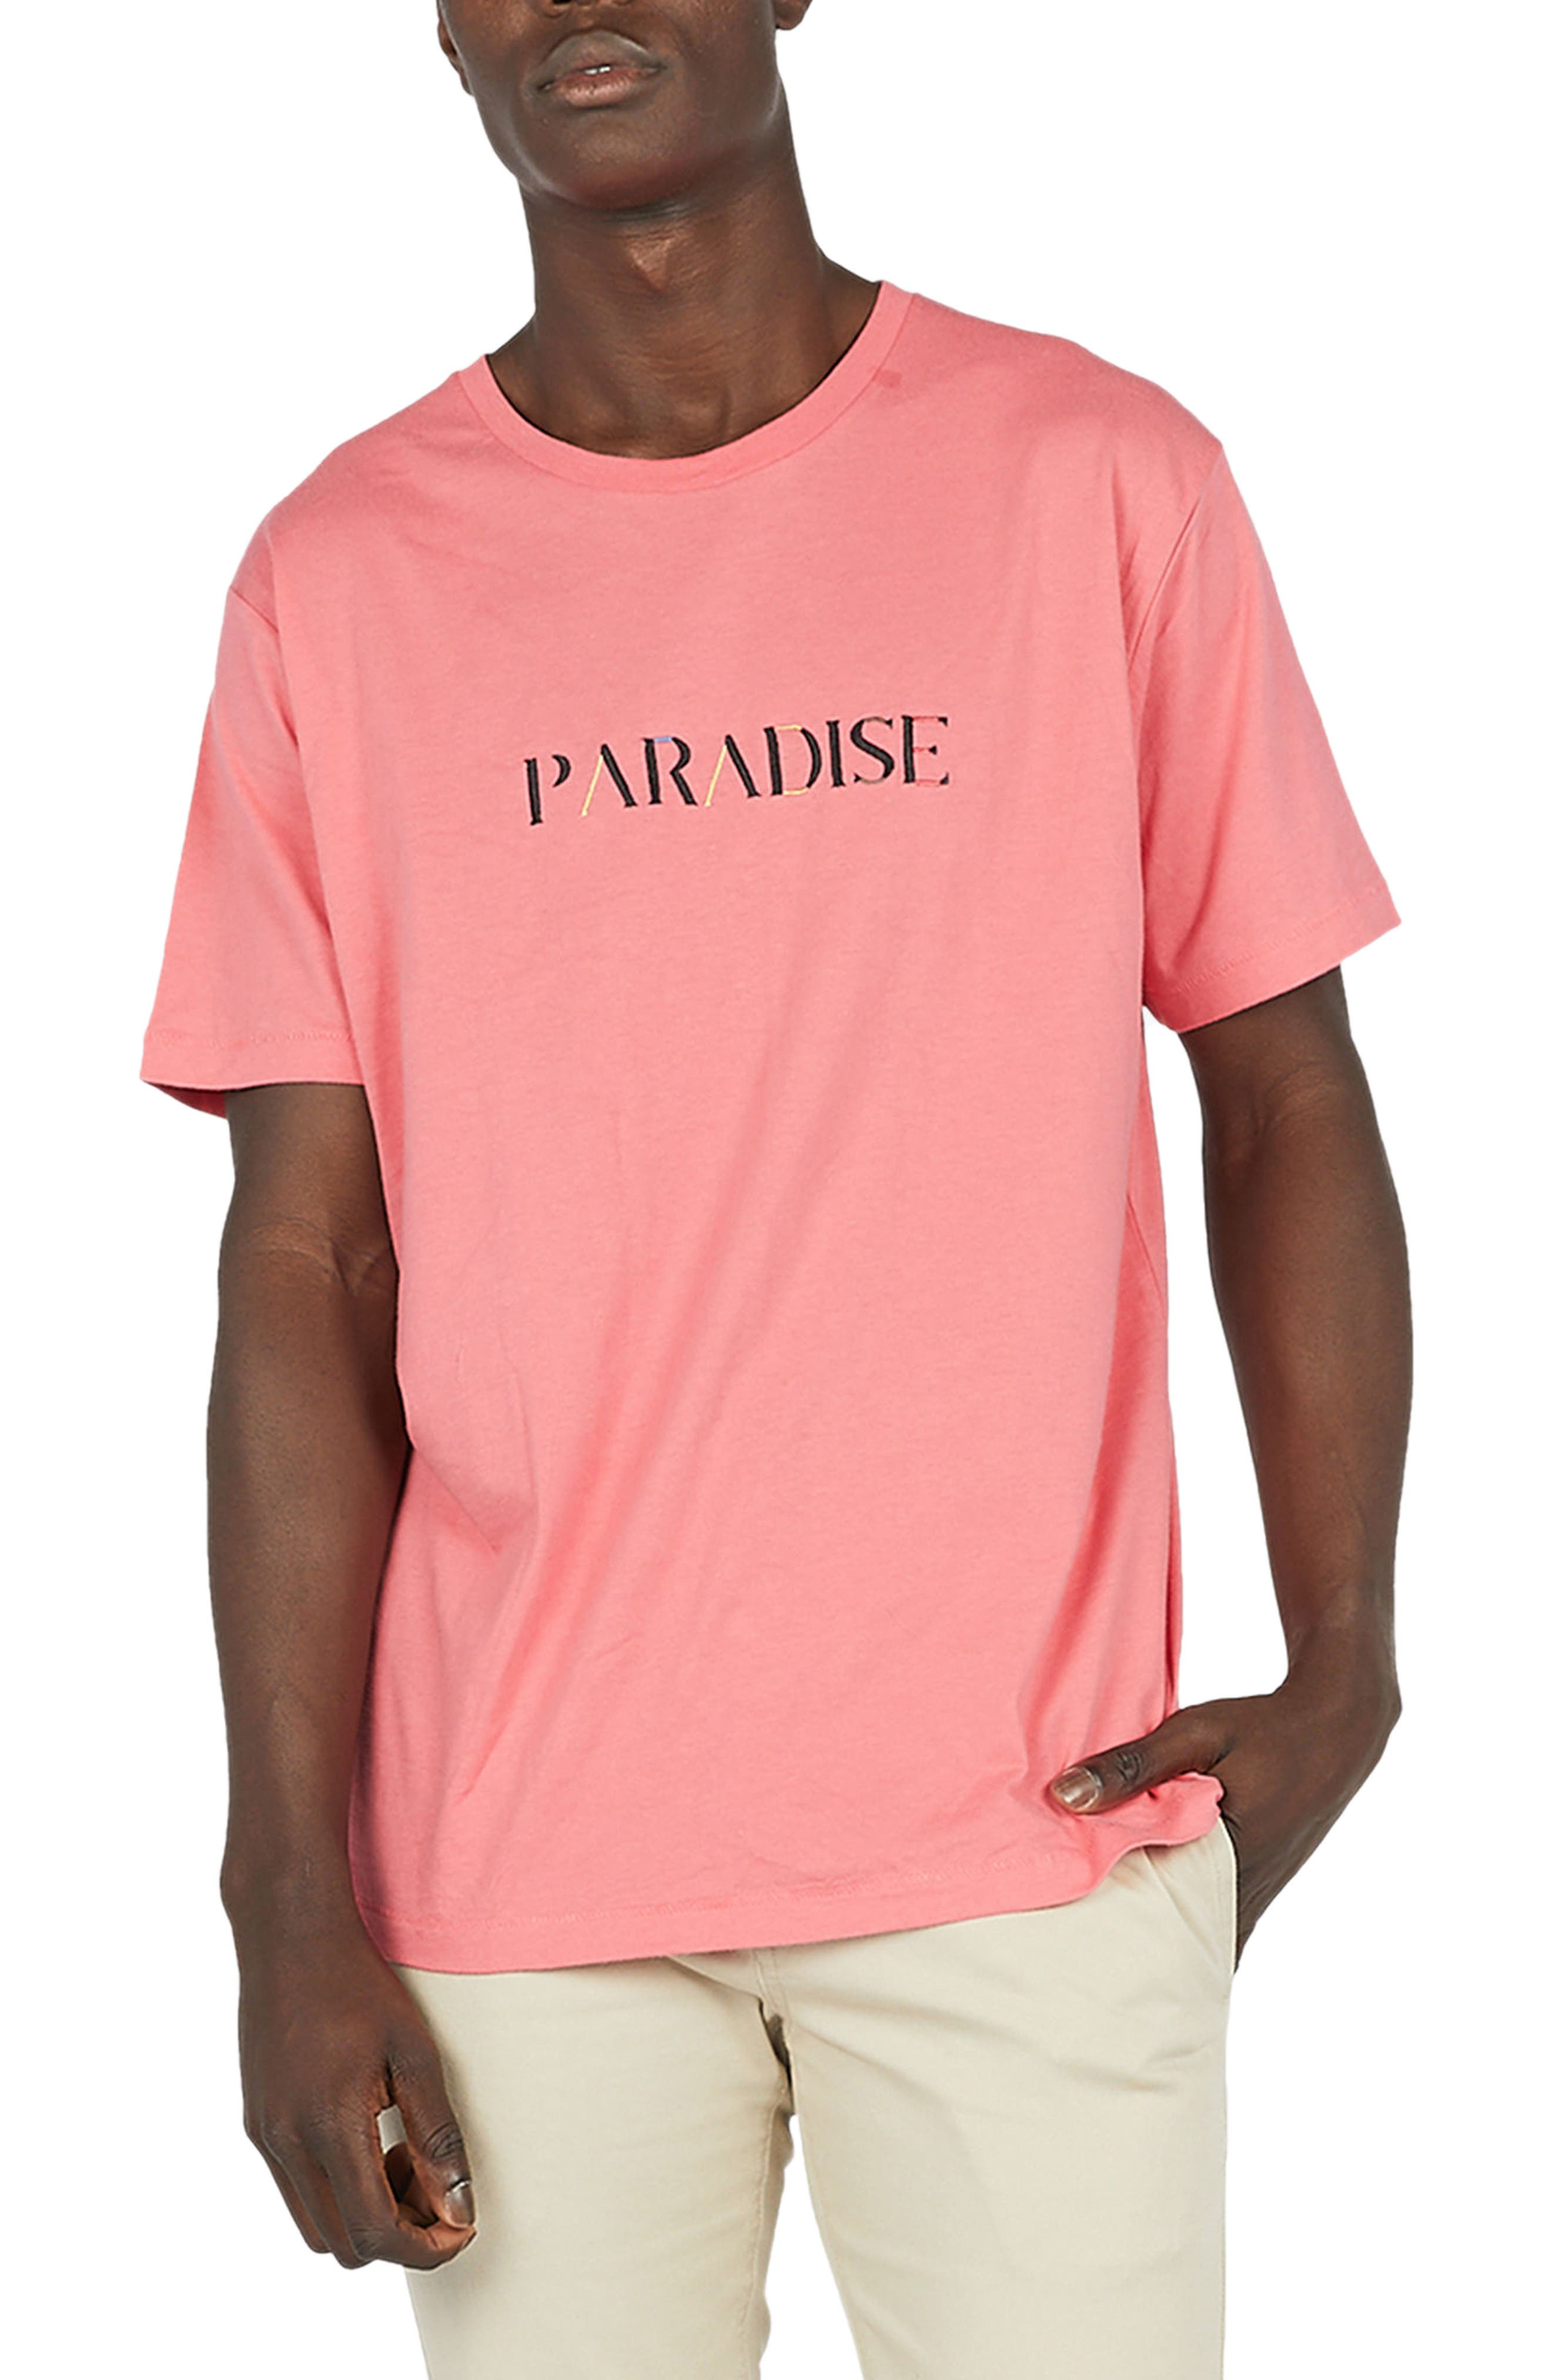 Barney Cools Paradise T-Shirt